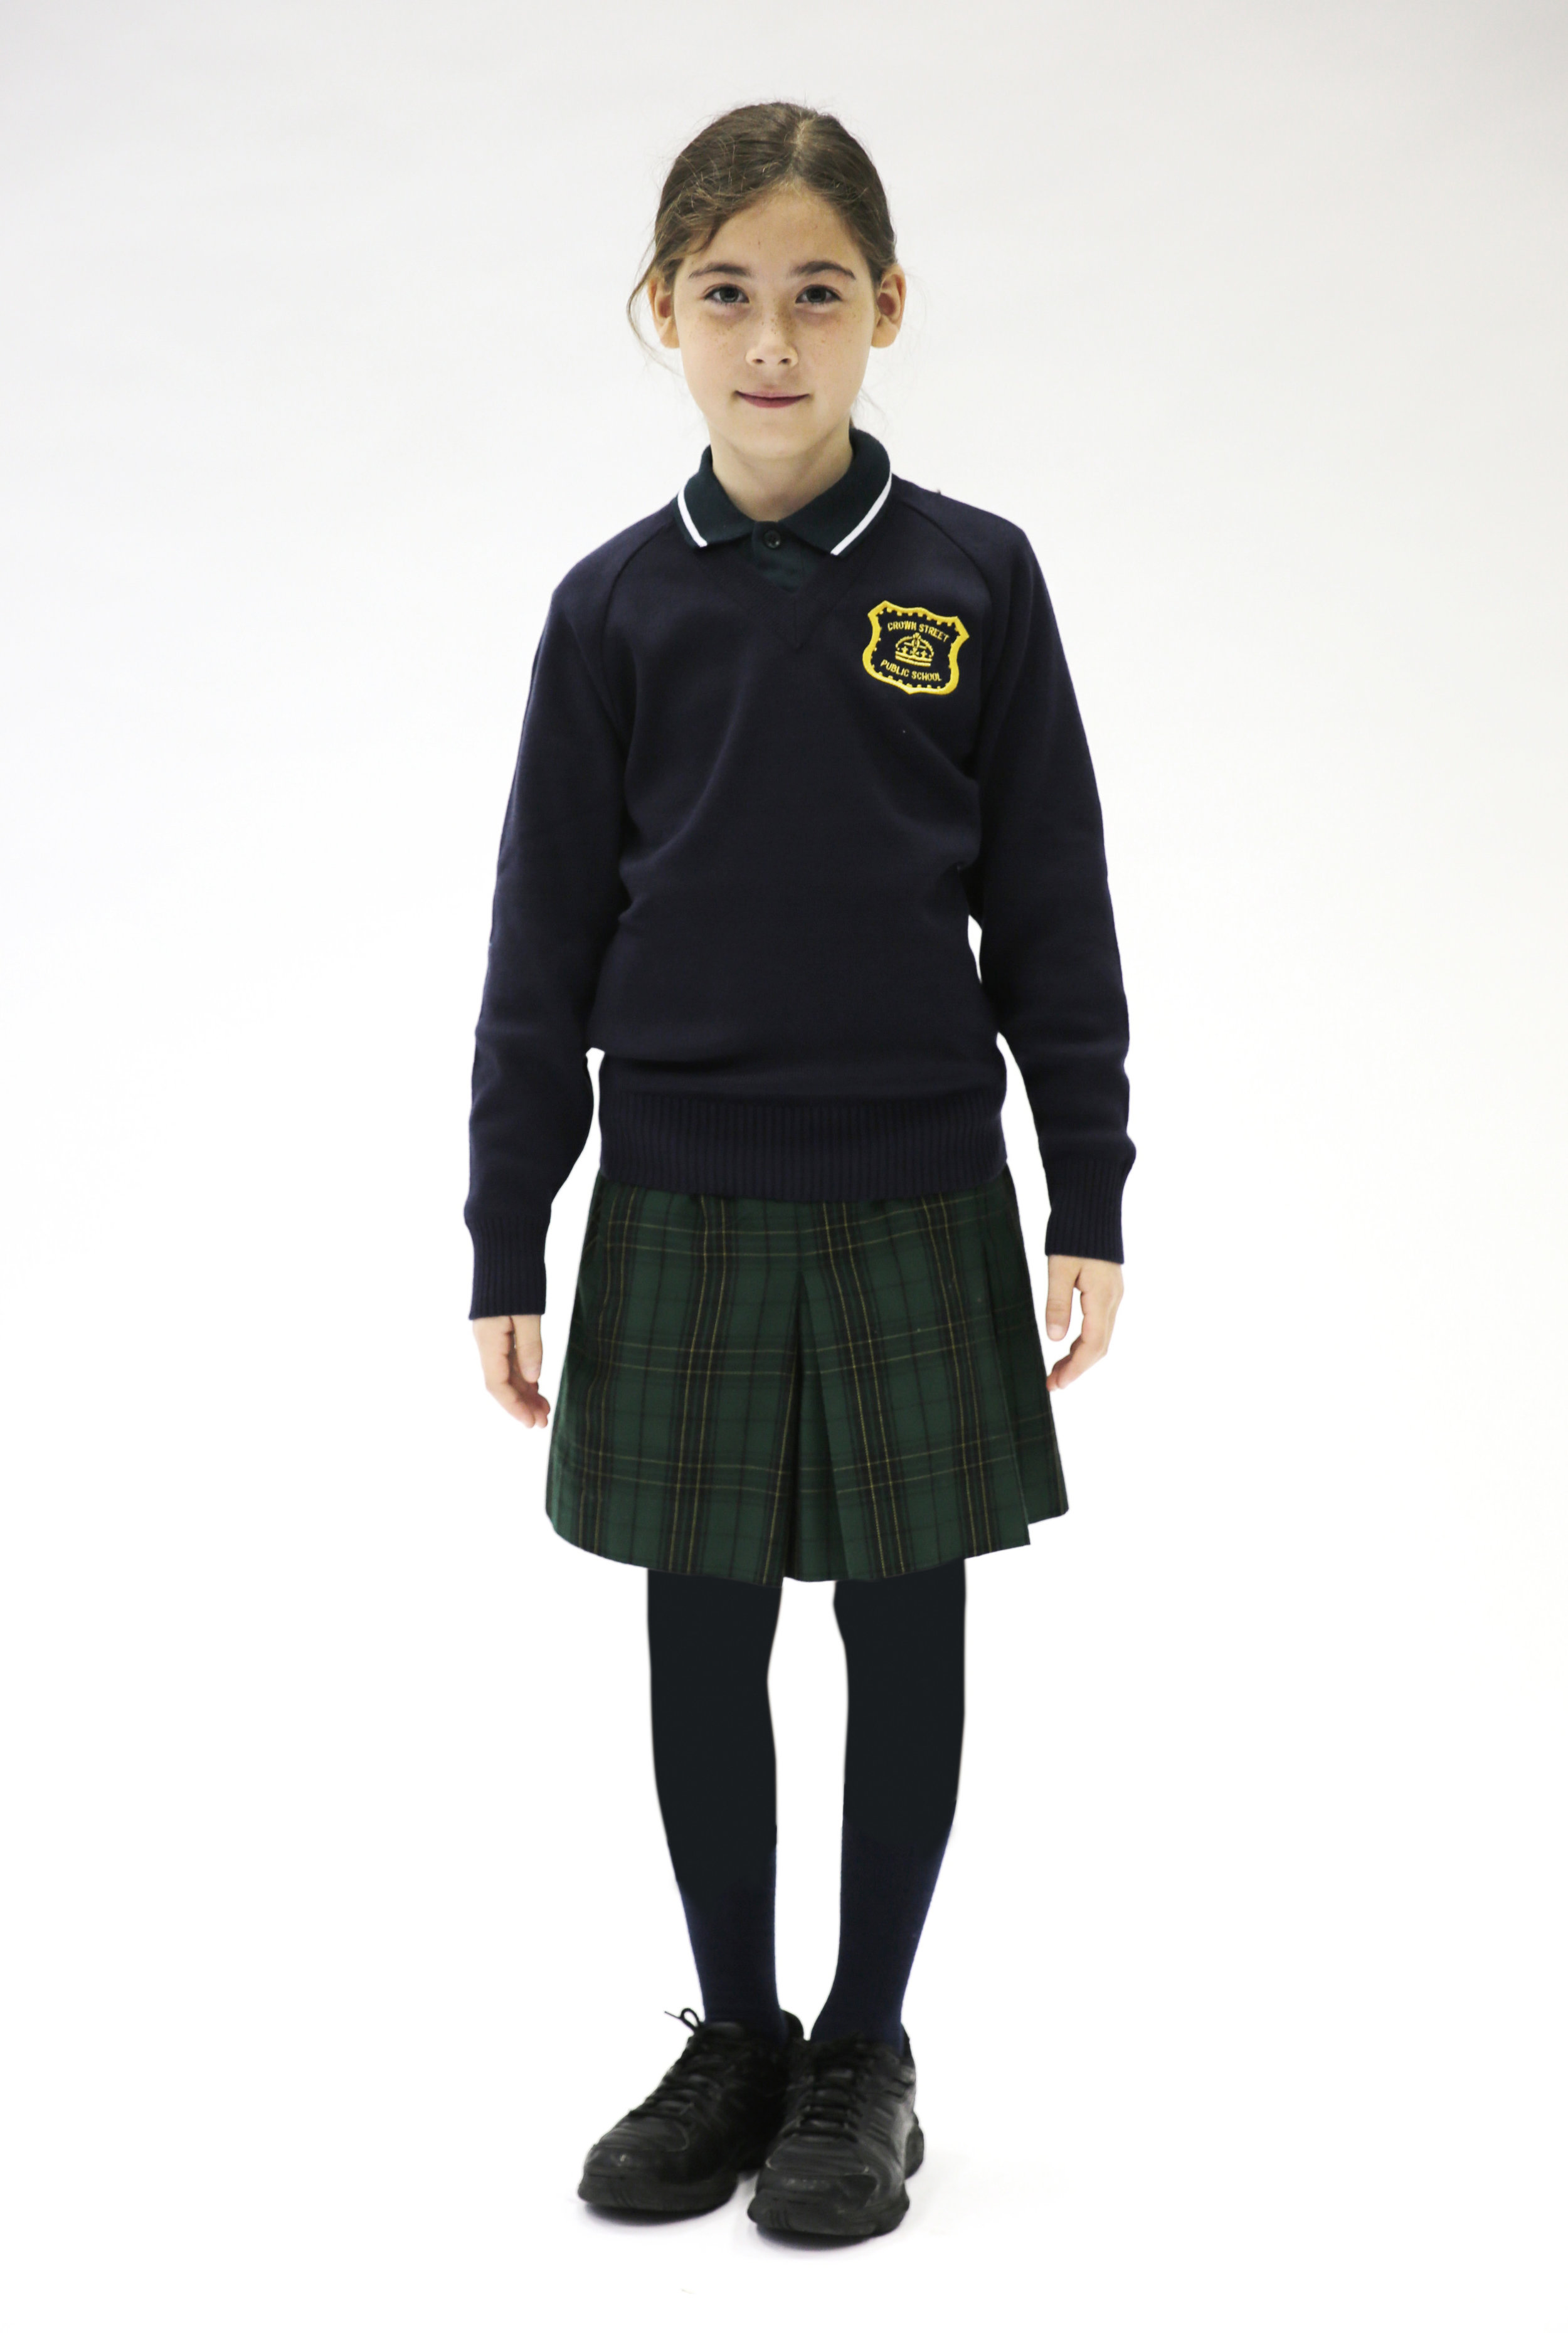 Long sleeve polo, jumper, tartan skirt, navy tights